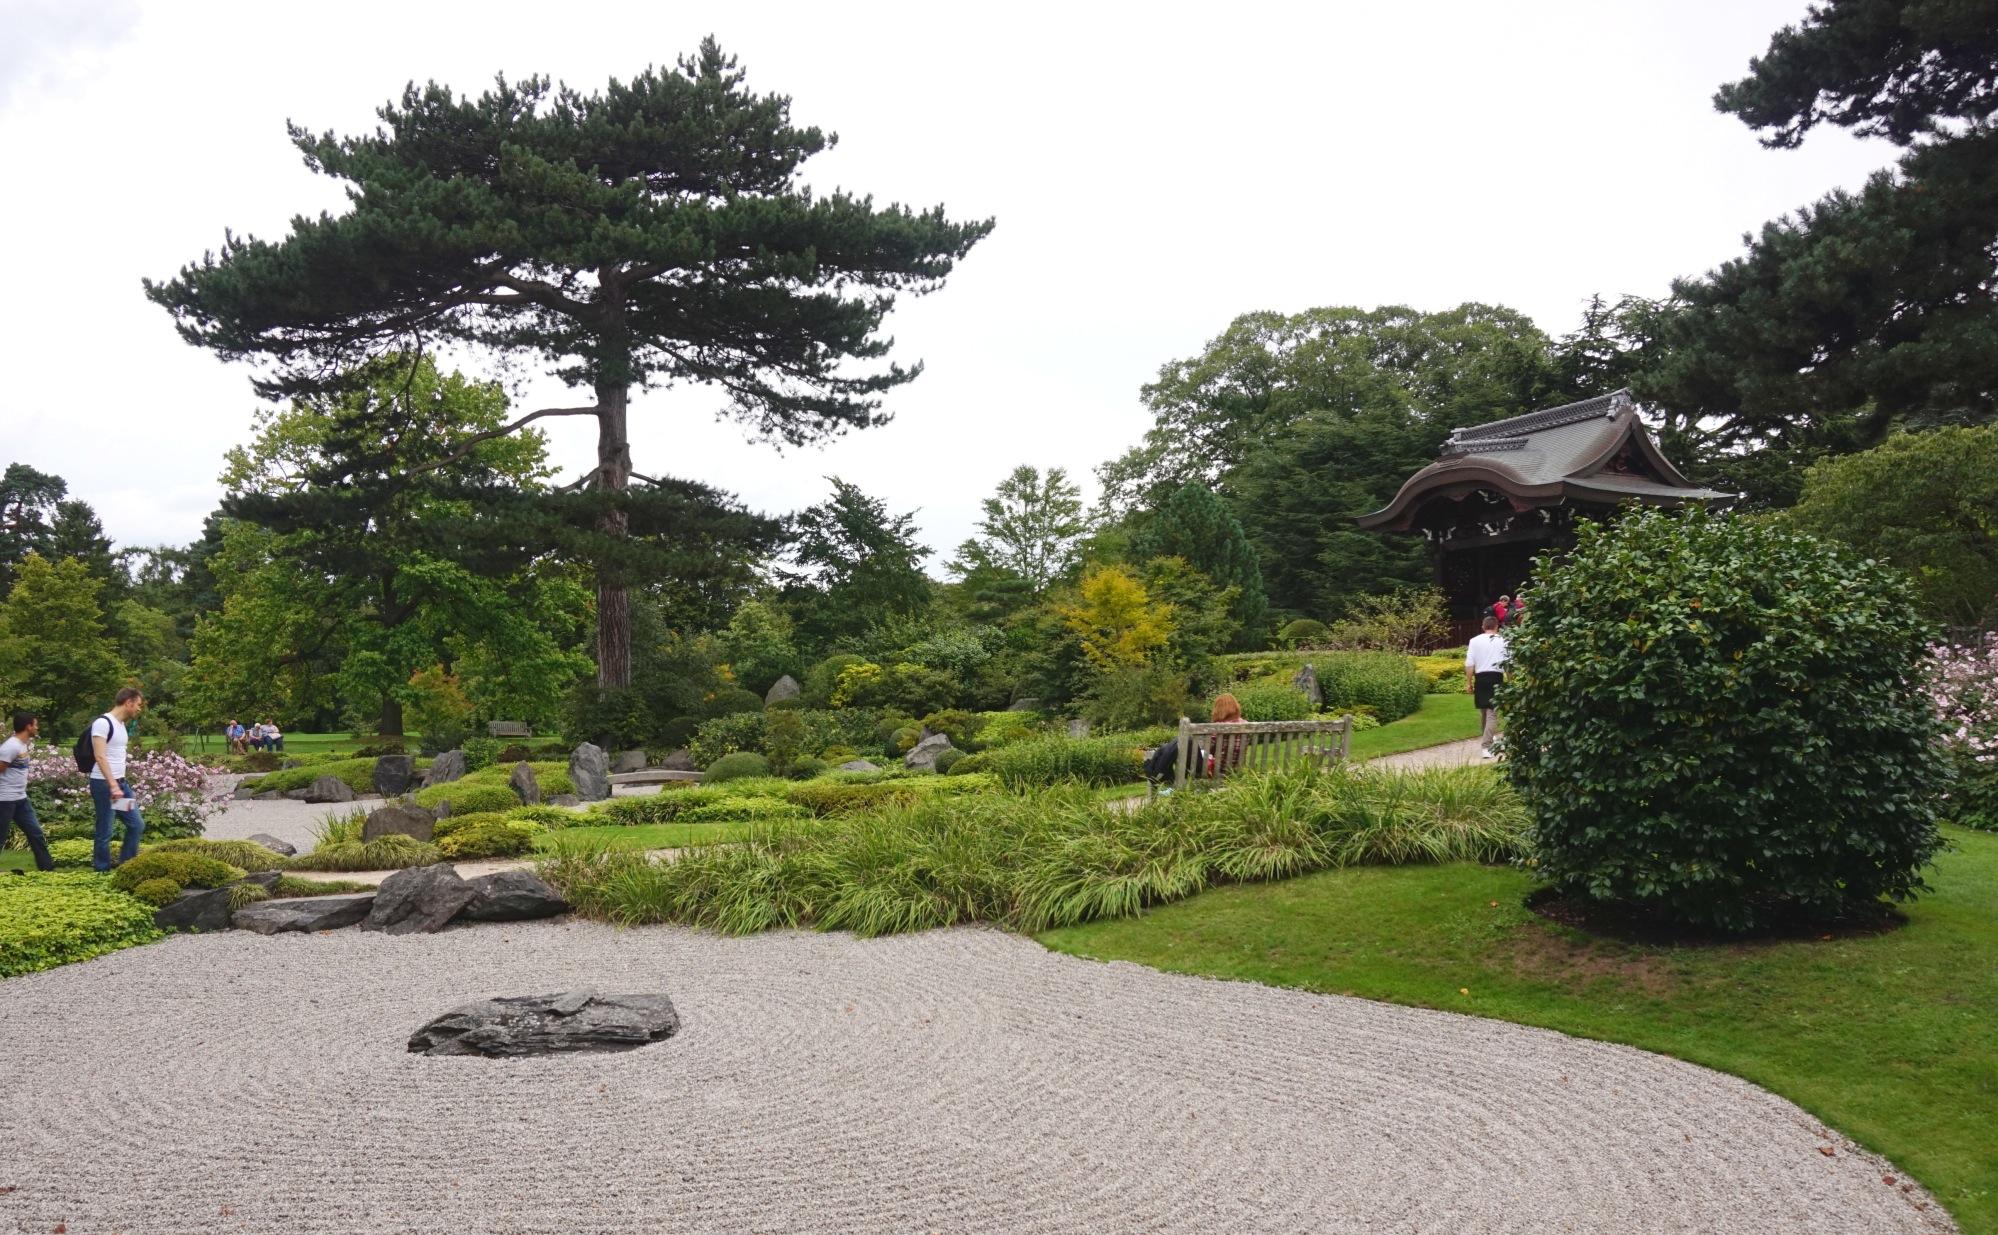 Visiter-Kew-Gardens-2